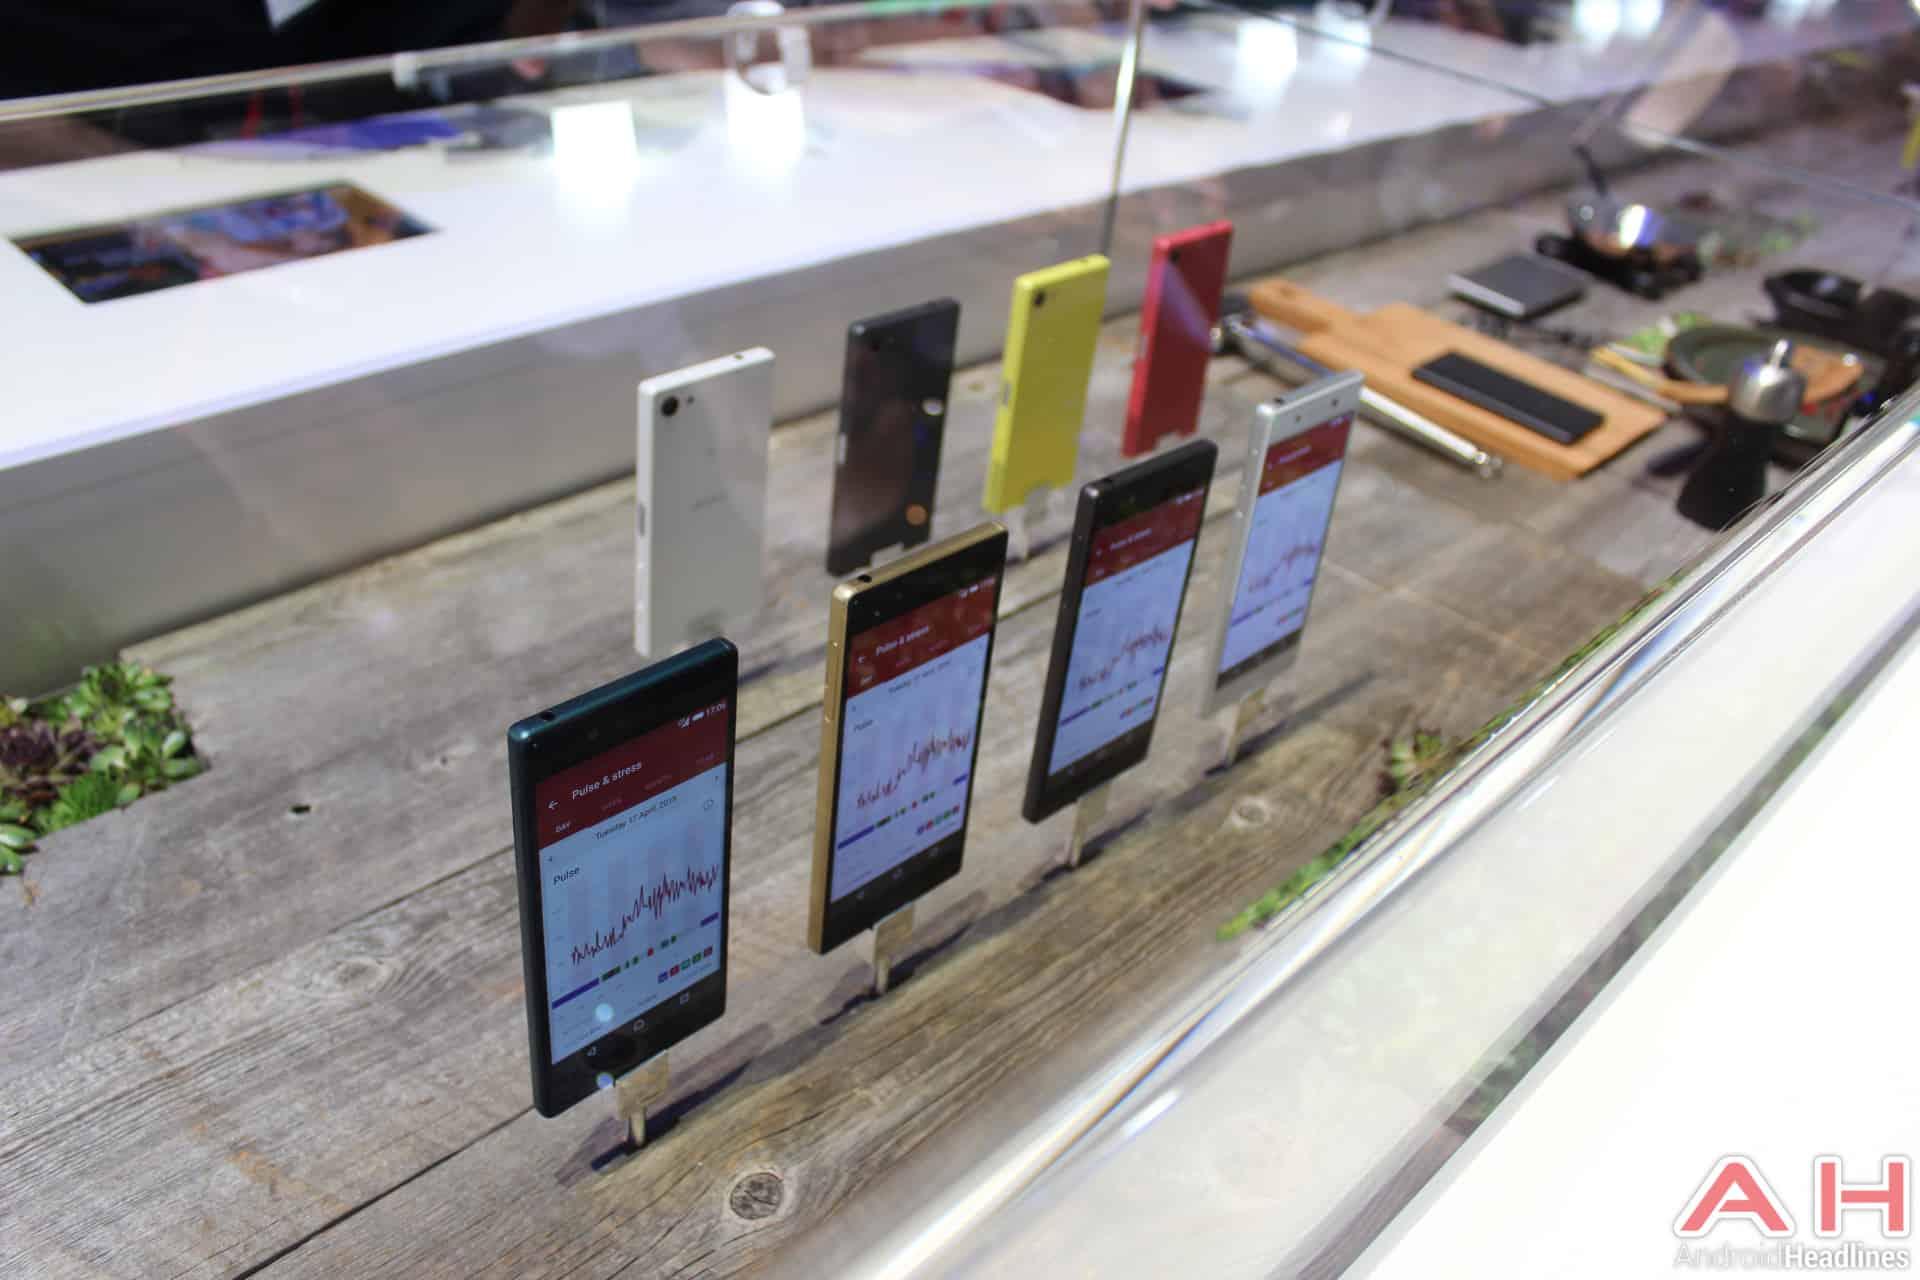 Sony Xperia Z5 Compact IFA AH 20